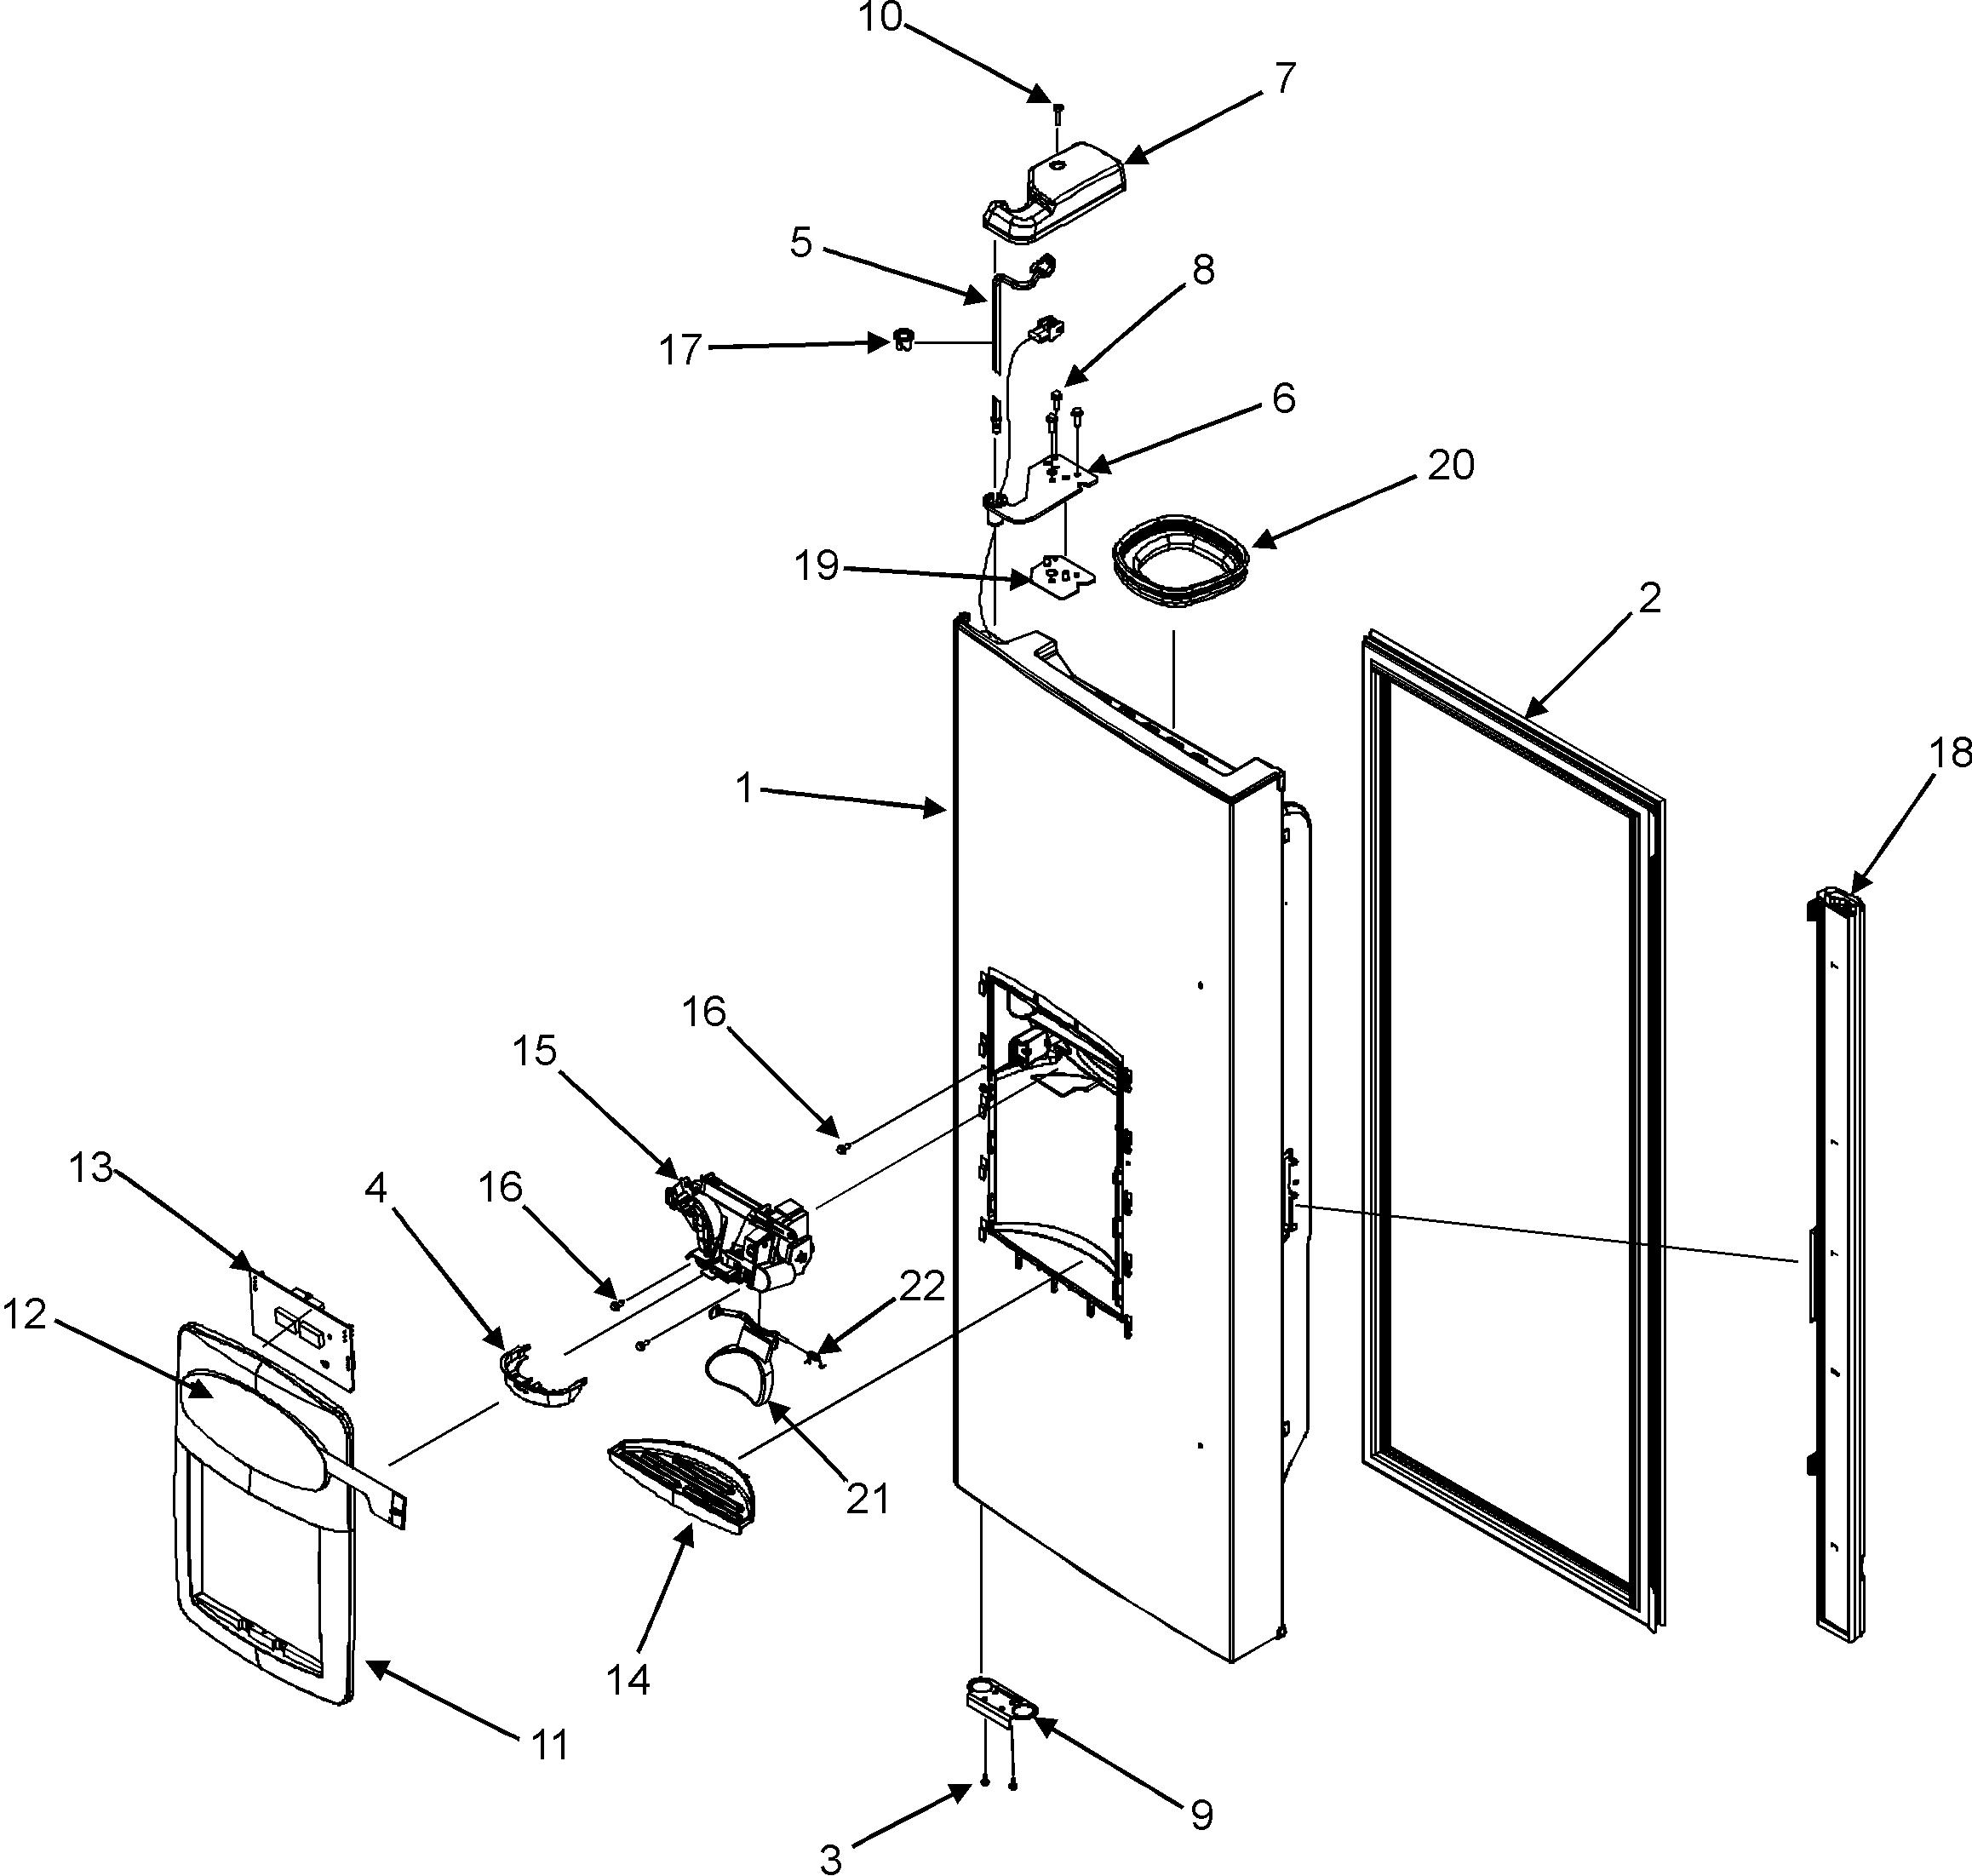 Maytag Fridge Diagram Not Lossing Wiring Magic Chef Gas Furnace Control Model Mfi2568aew Bottom Mount Refrigerator Genuine Parts Rh Searspartsdirect Com Circuit